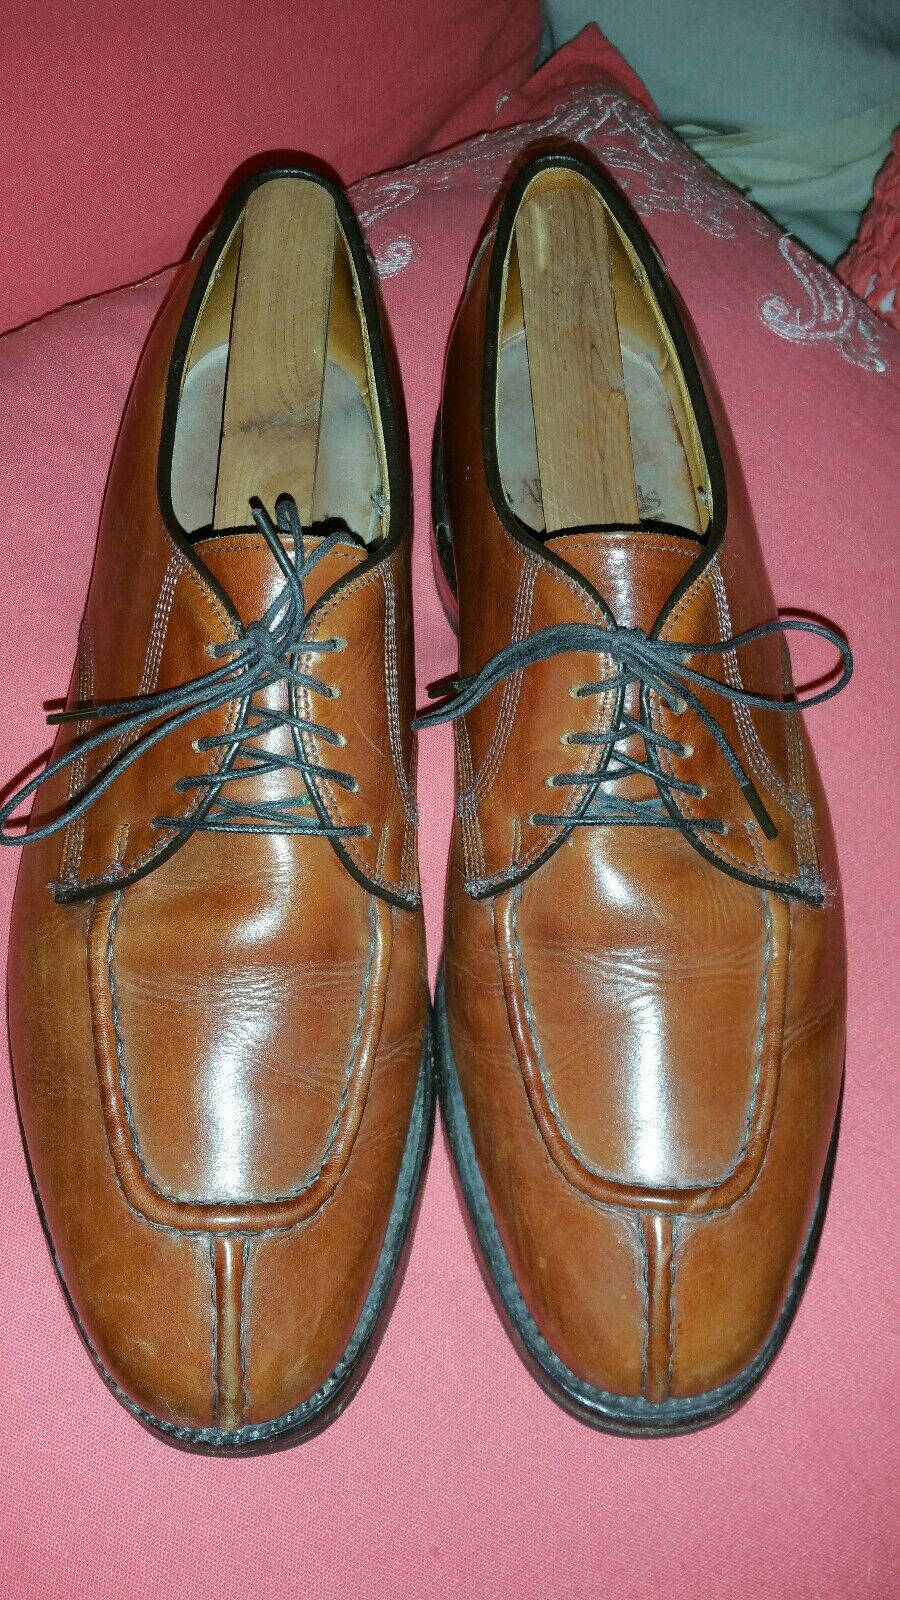 Allen Edmonds Edmonds Edmonds braun Oxfords Sz 9.5 D Dellwood dress casual 59955b